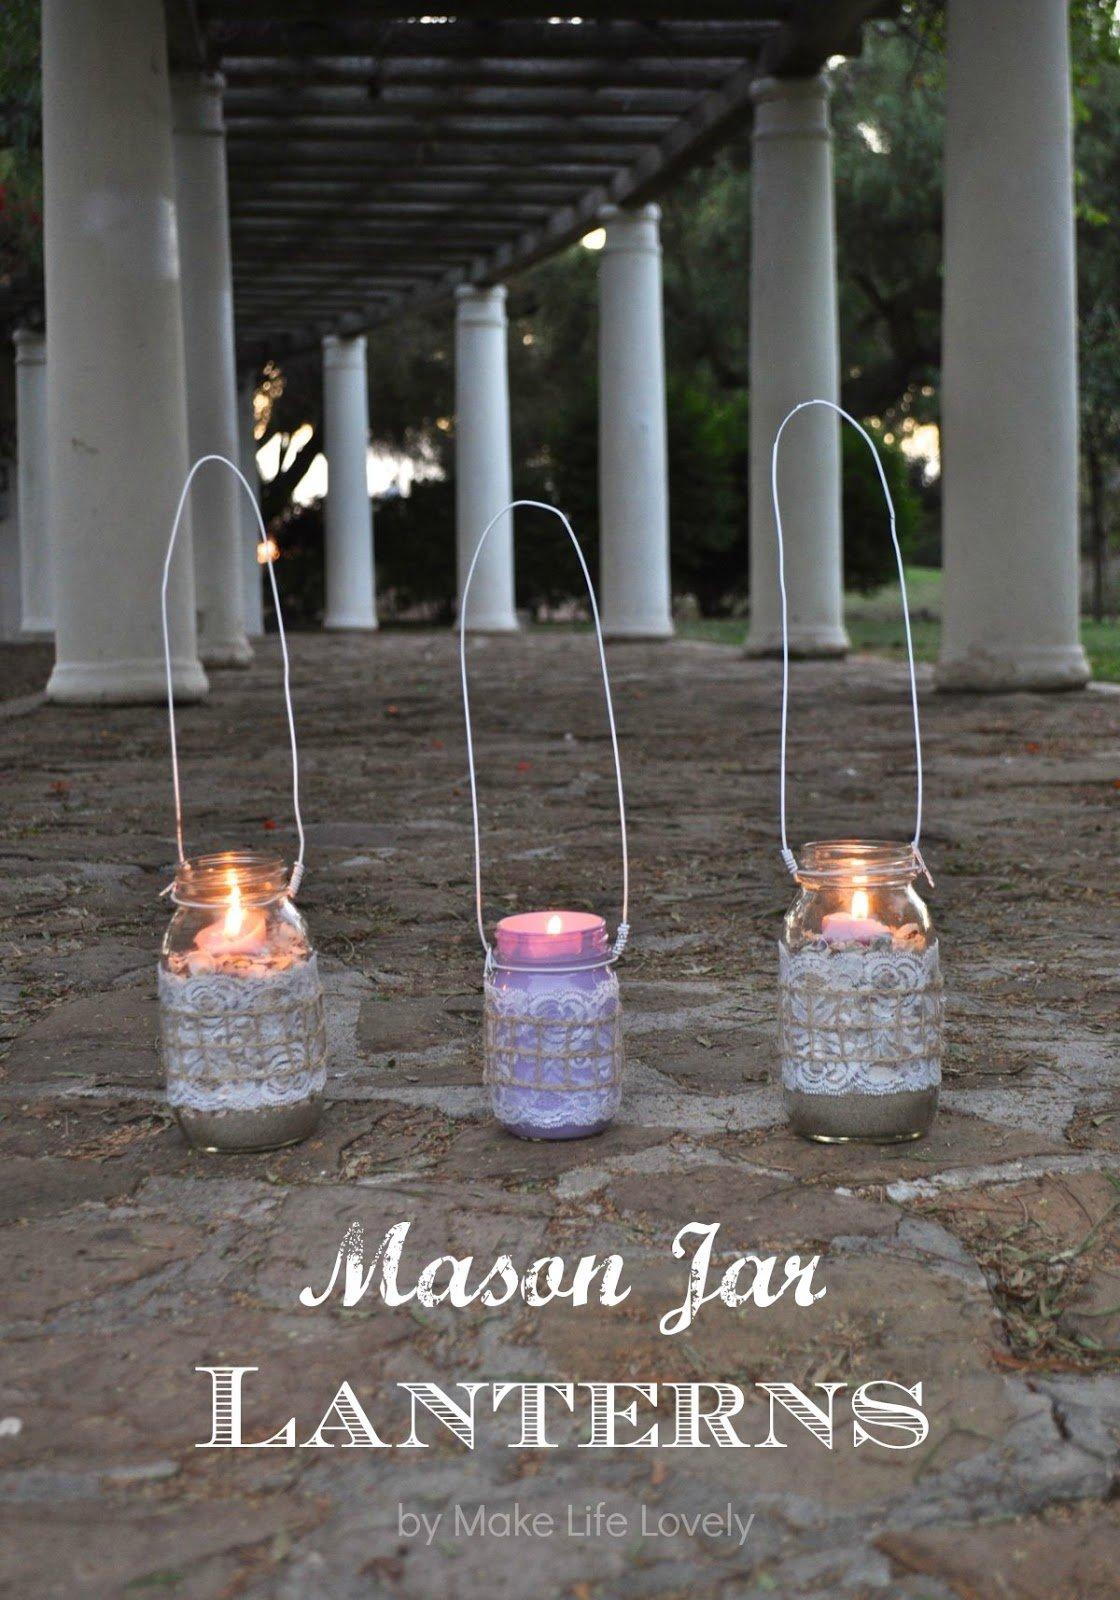 Diy Mason Jar Flower Wall Decor: How To Make Mason Jar Lanterns